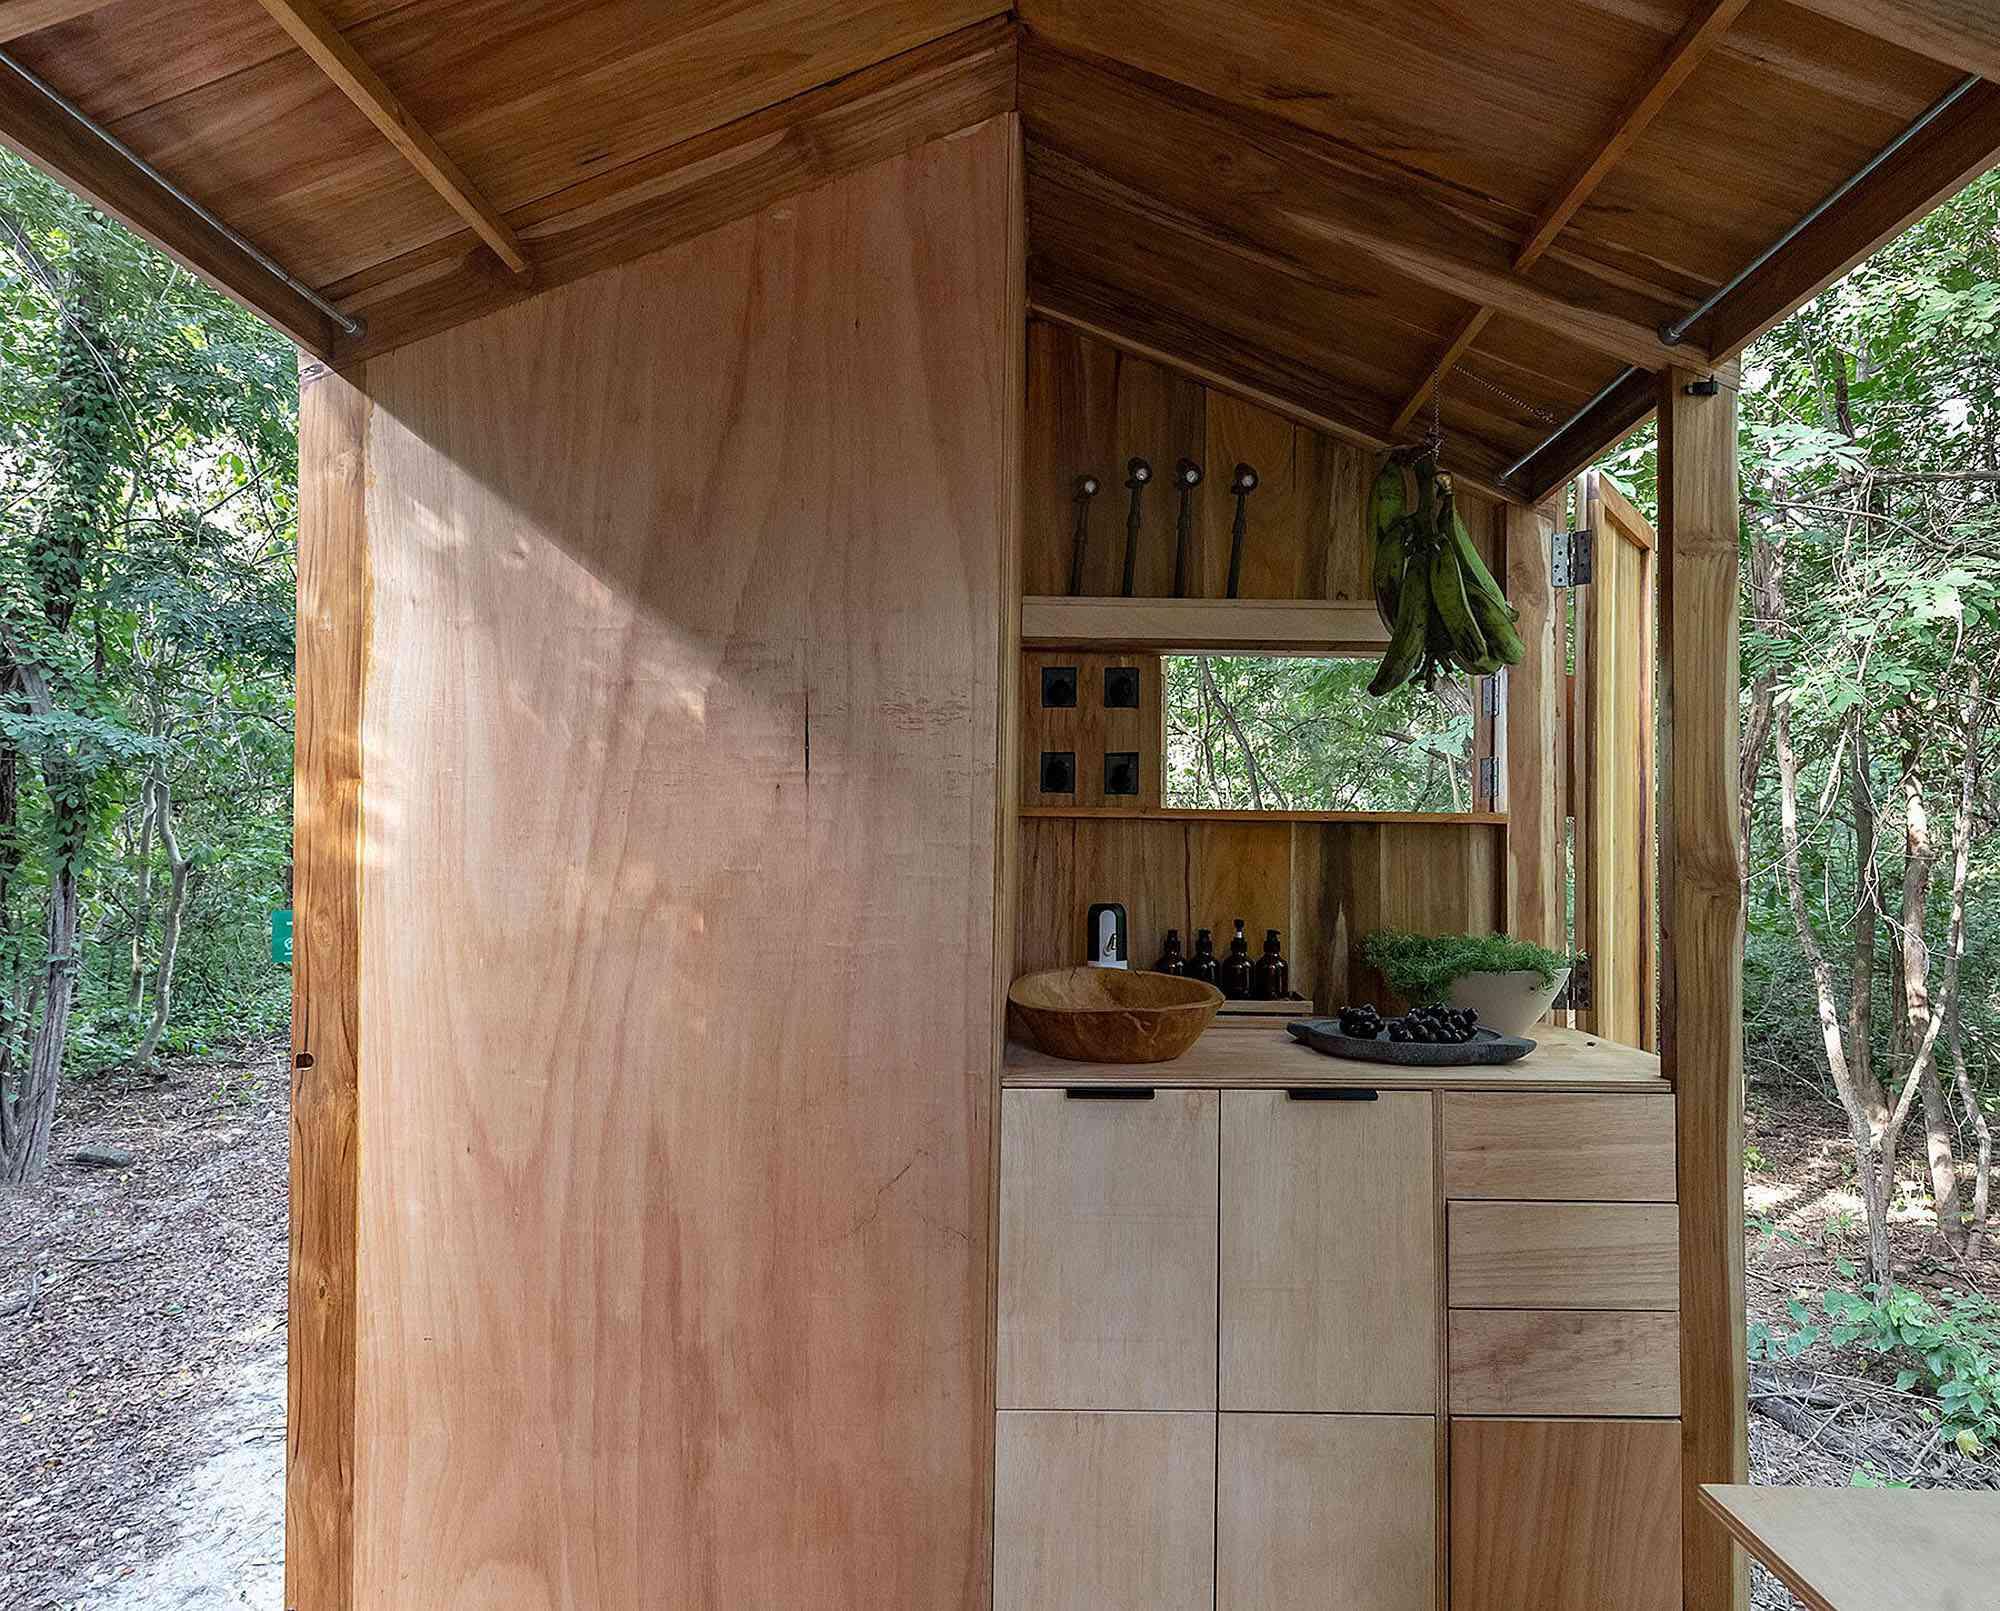 La Casa Nueva mobile diy camper JAG Studio kitchenette